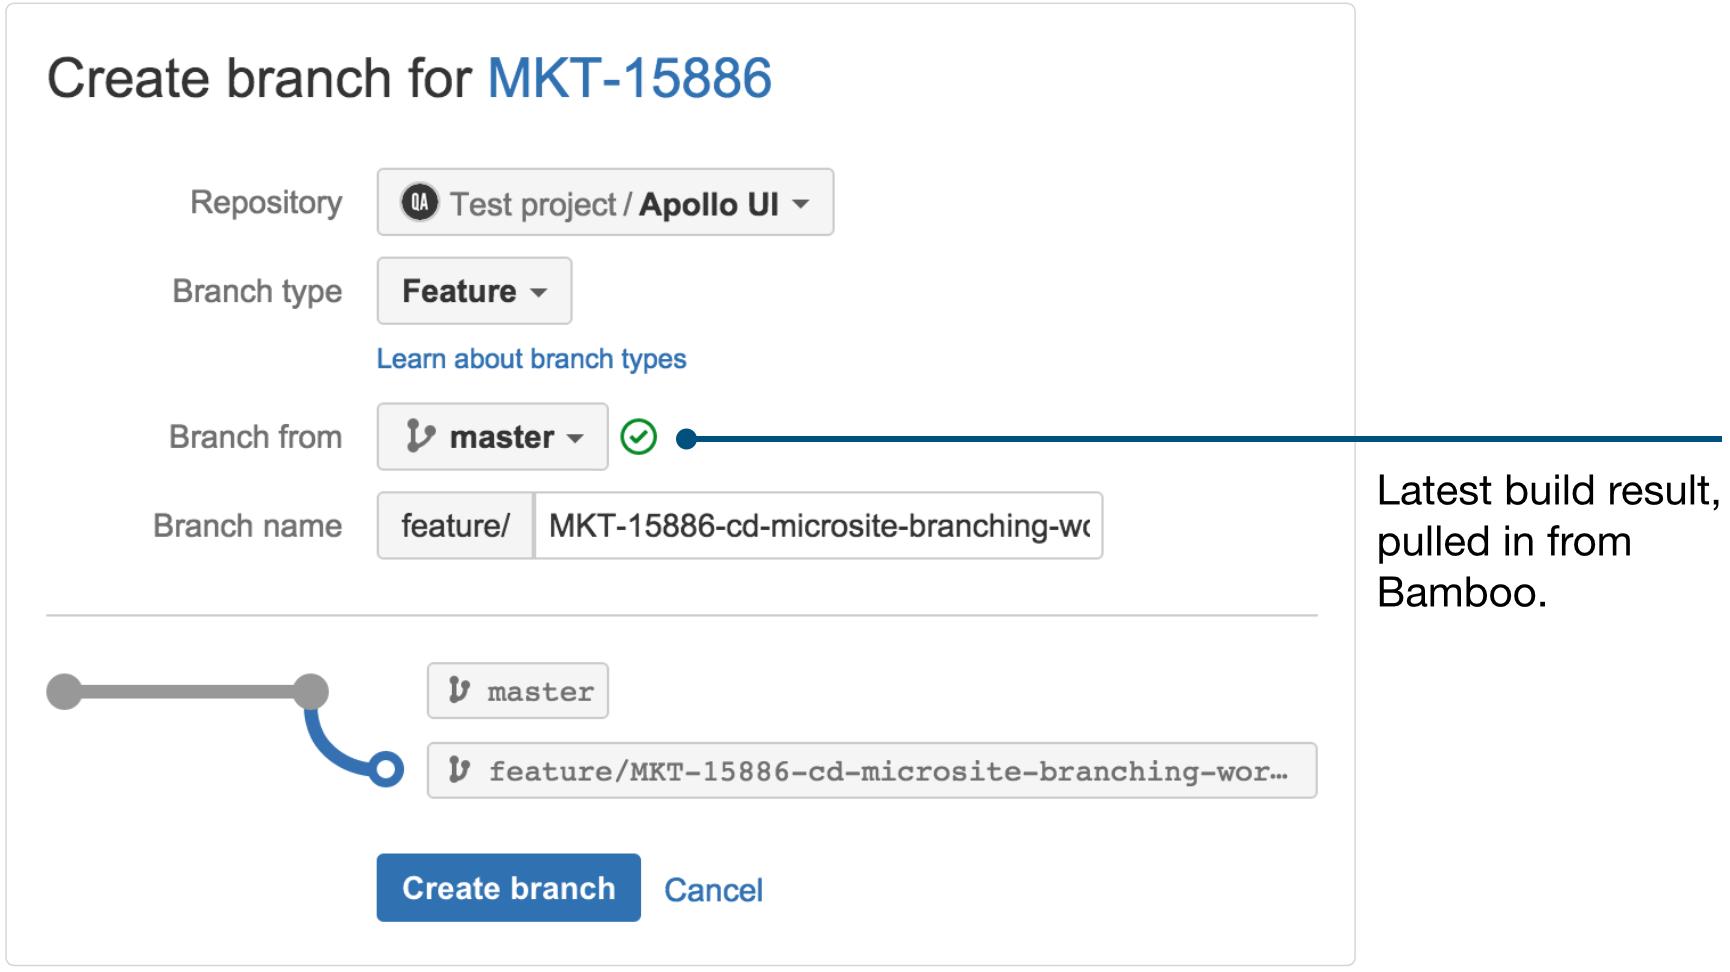 Create branch workflows screenshot   Atlassian CI/CD